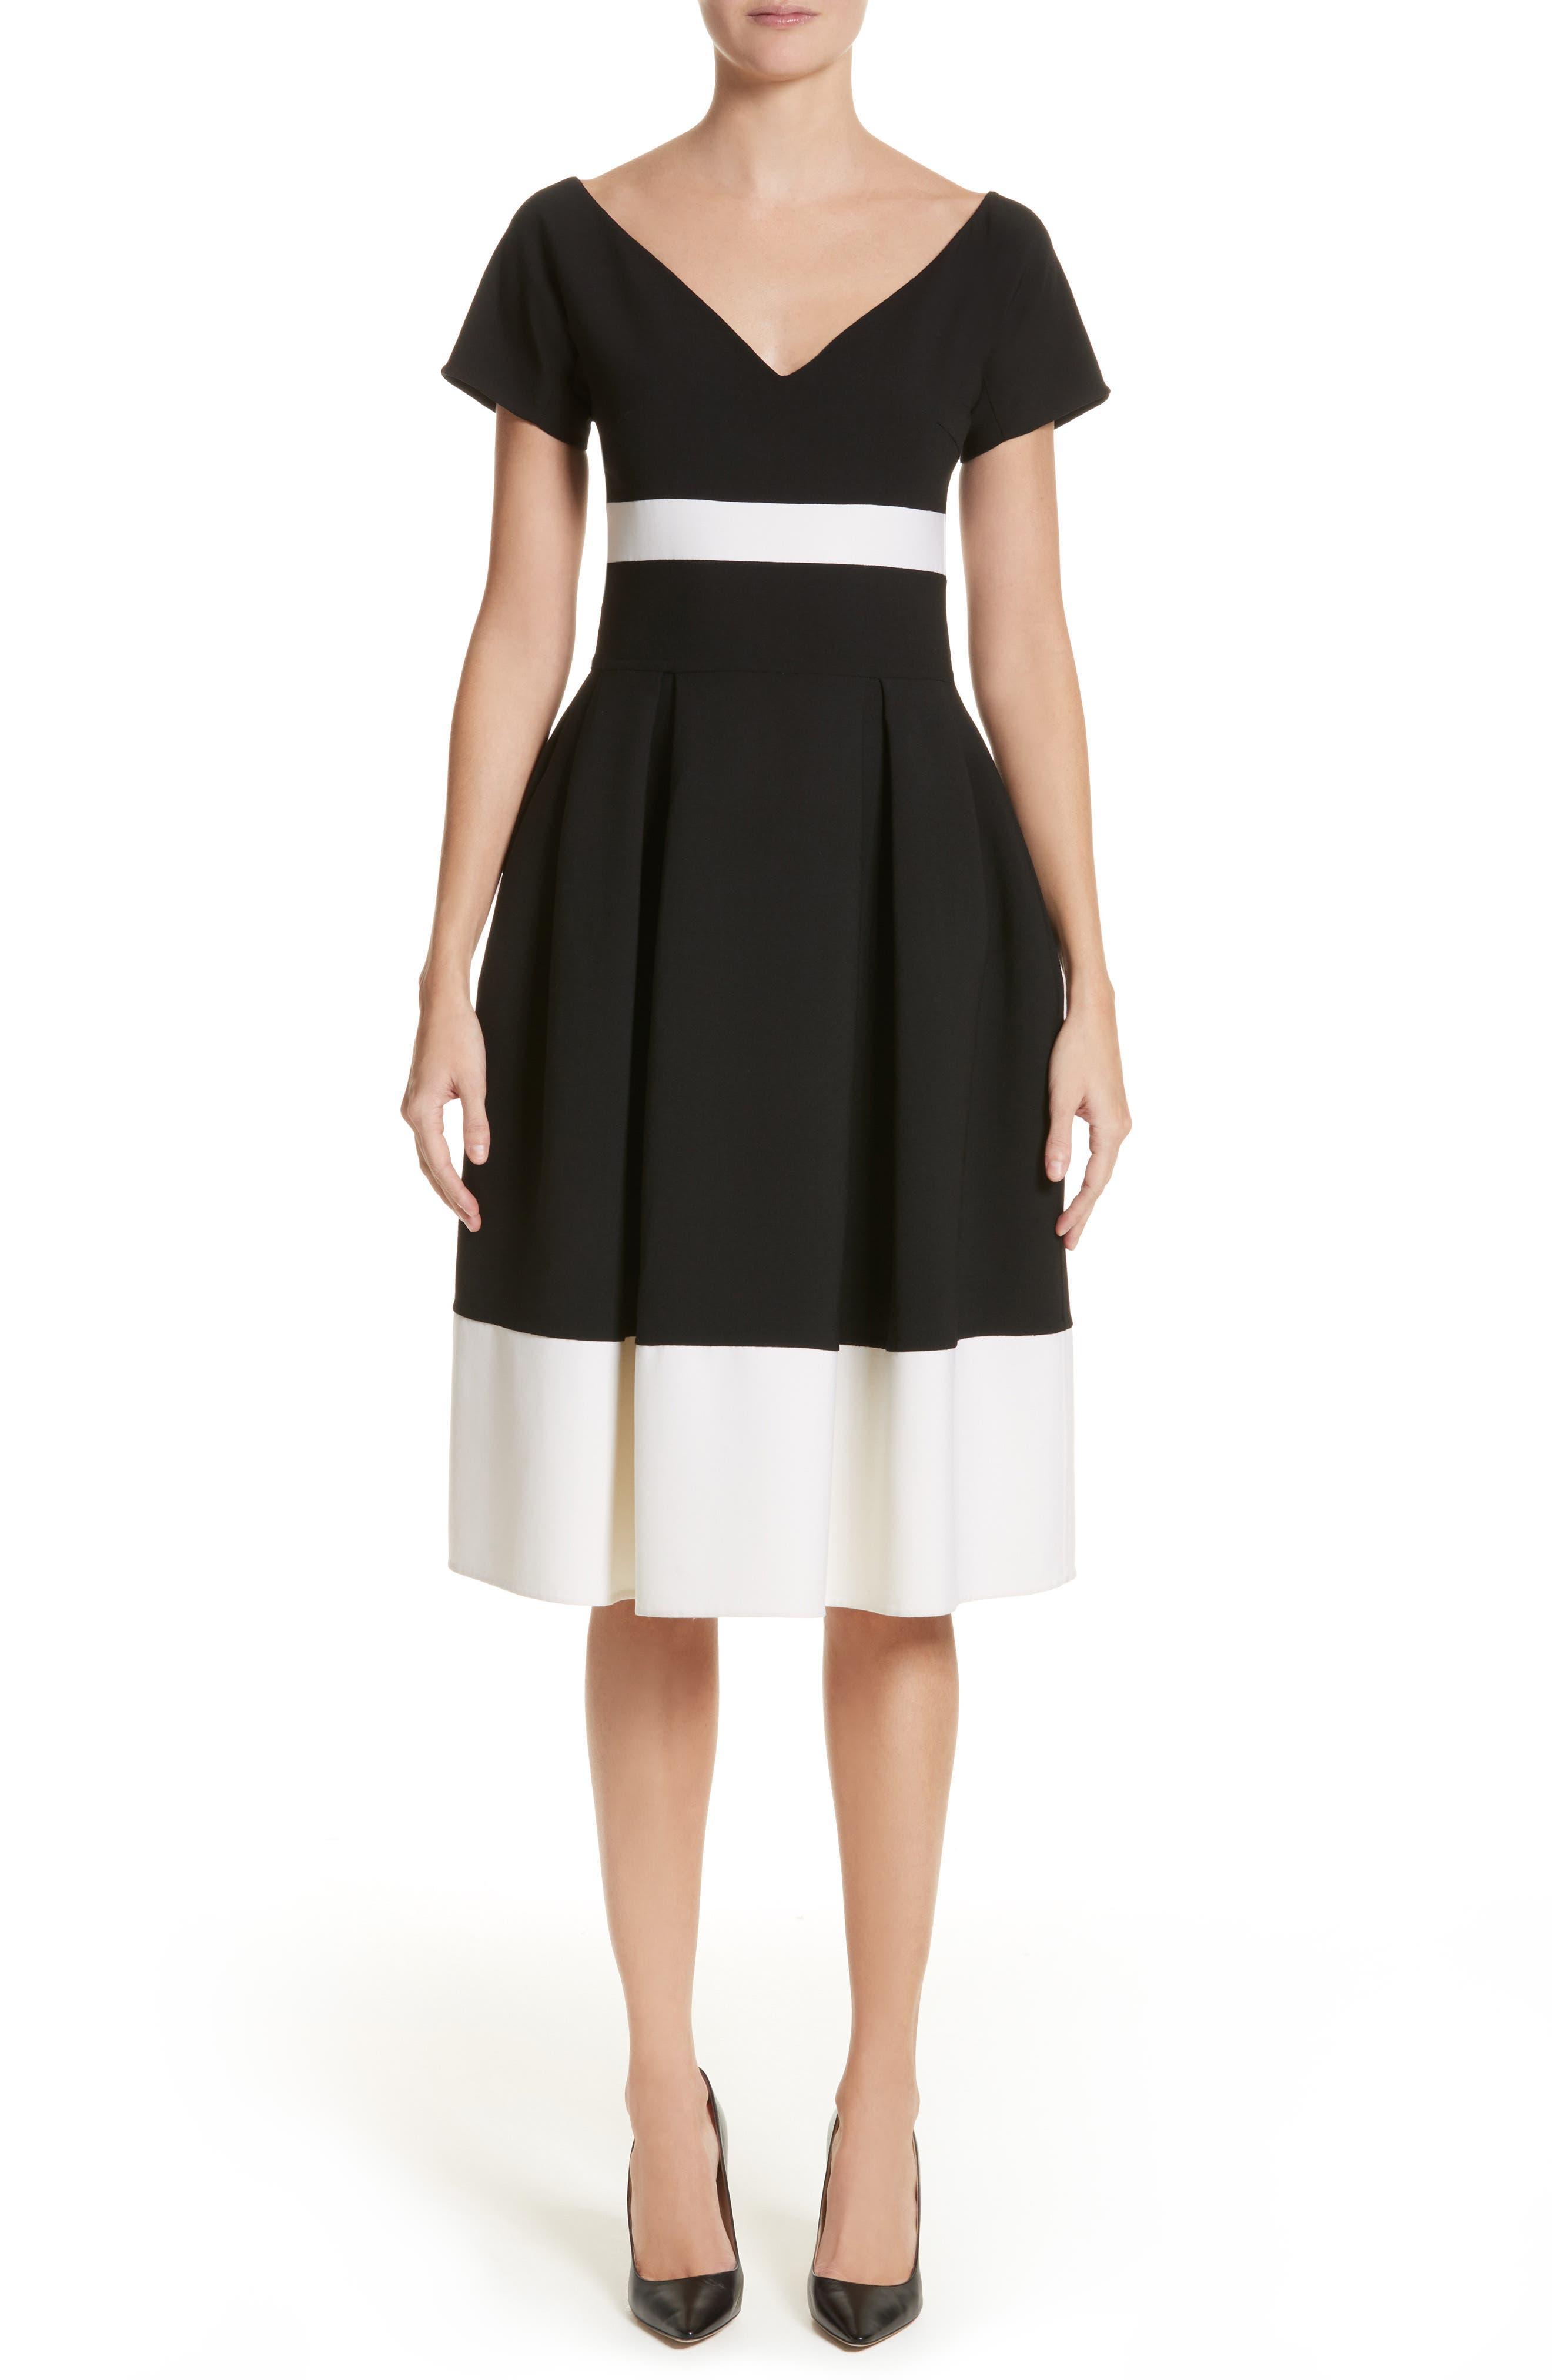 Alternate Image 1 Selected - Carolina Herrera Colorblock Cap Sleeve Dress